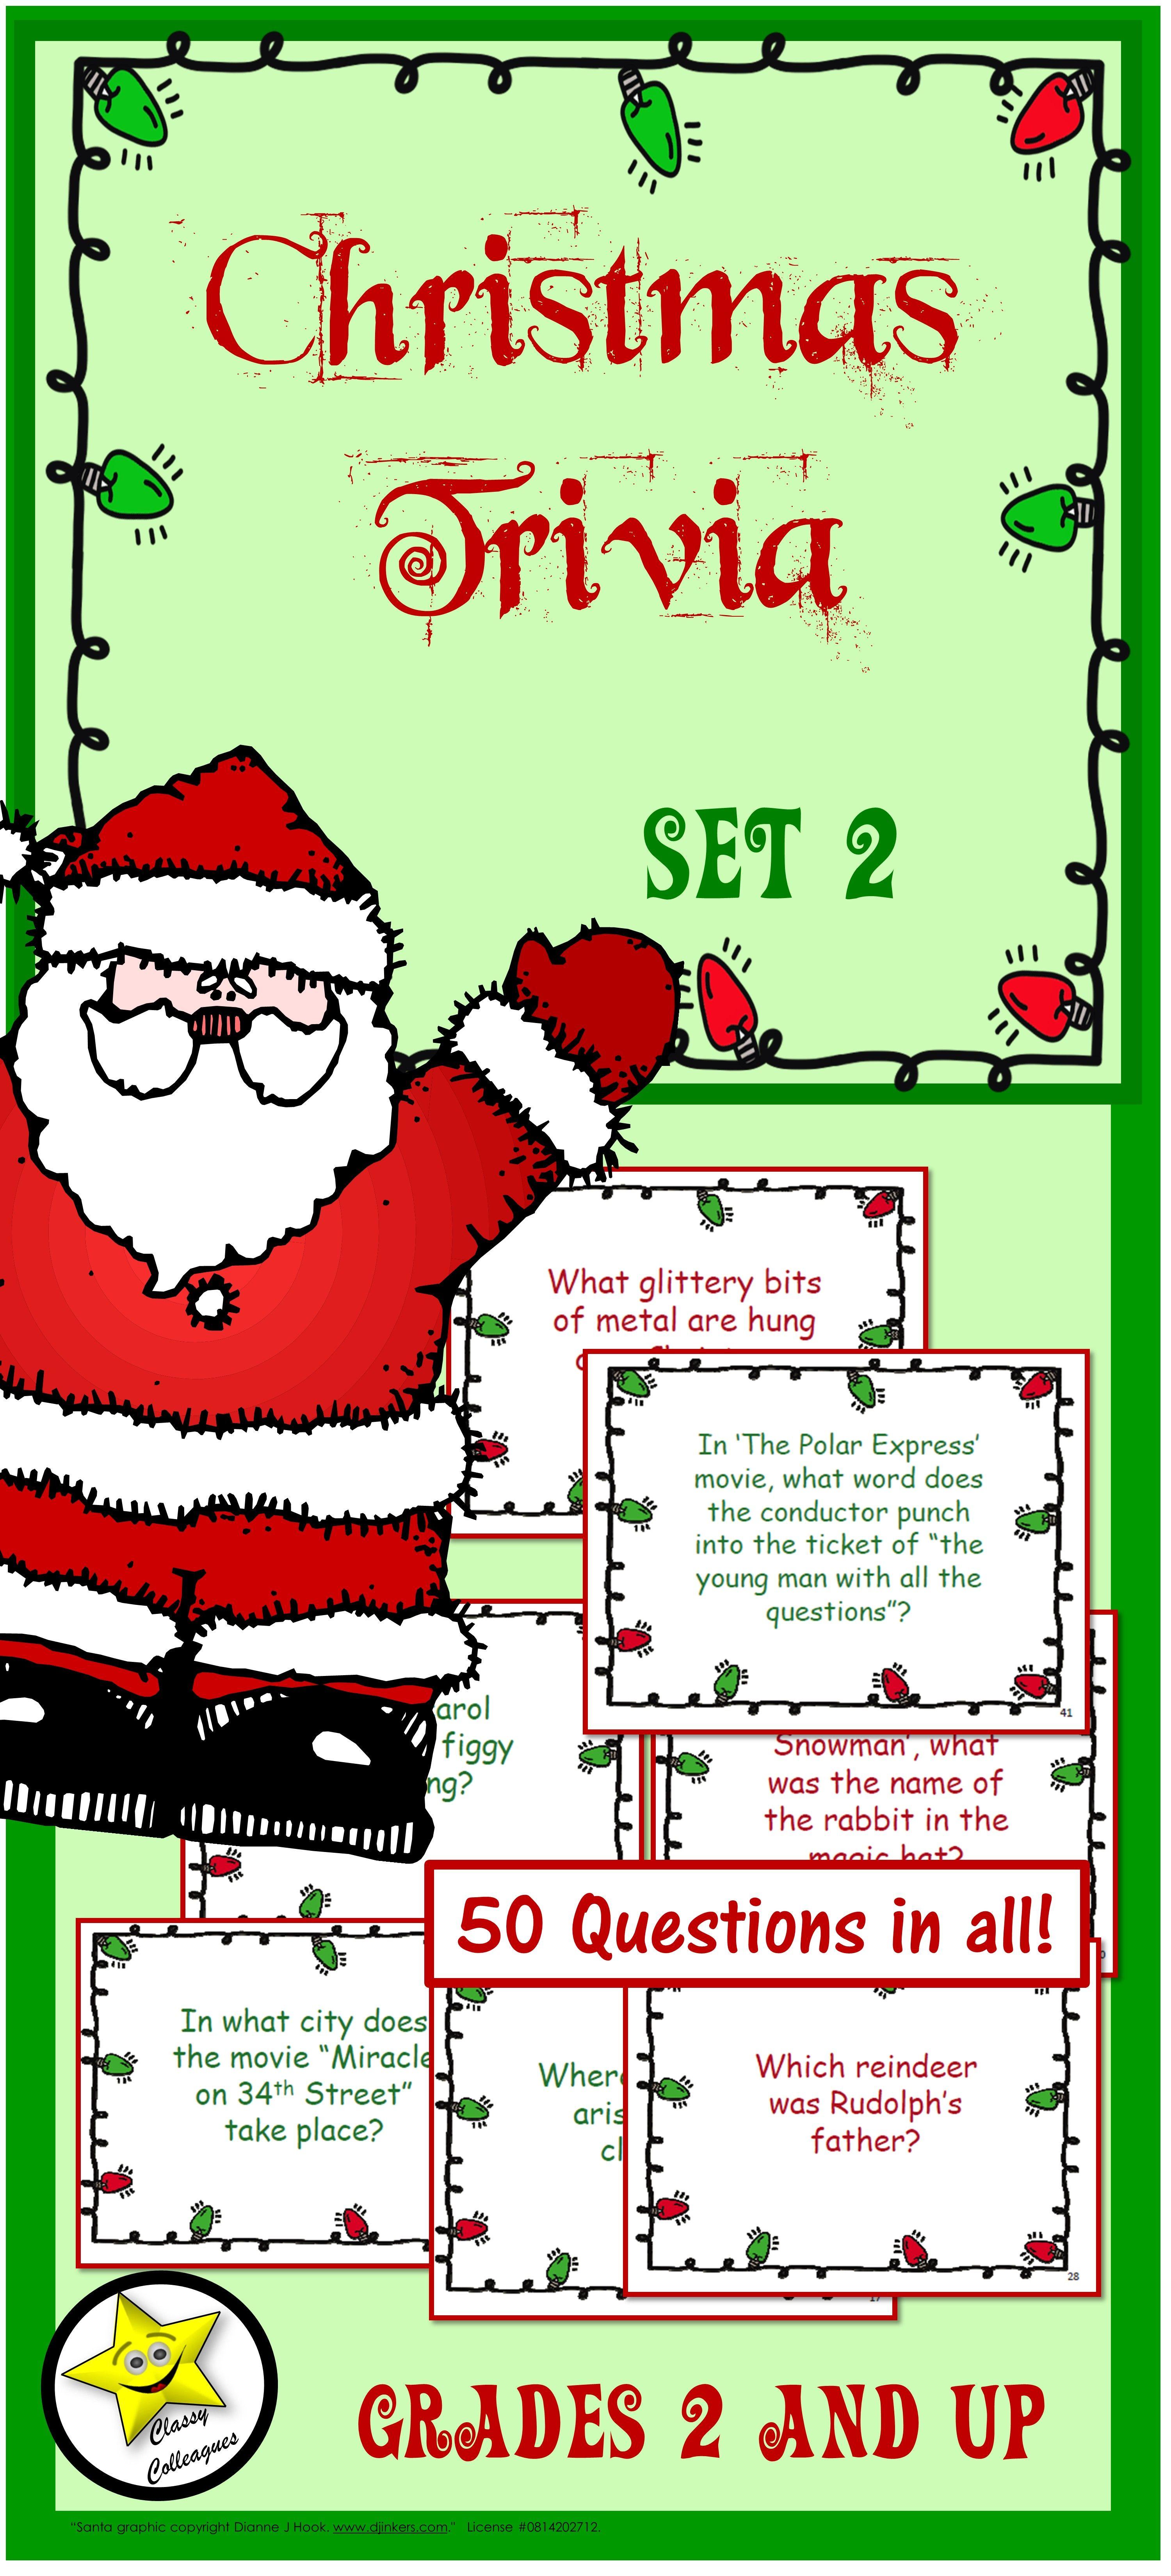 Christmas Trivia Set 2